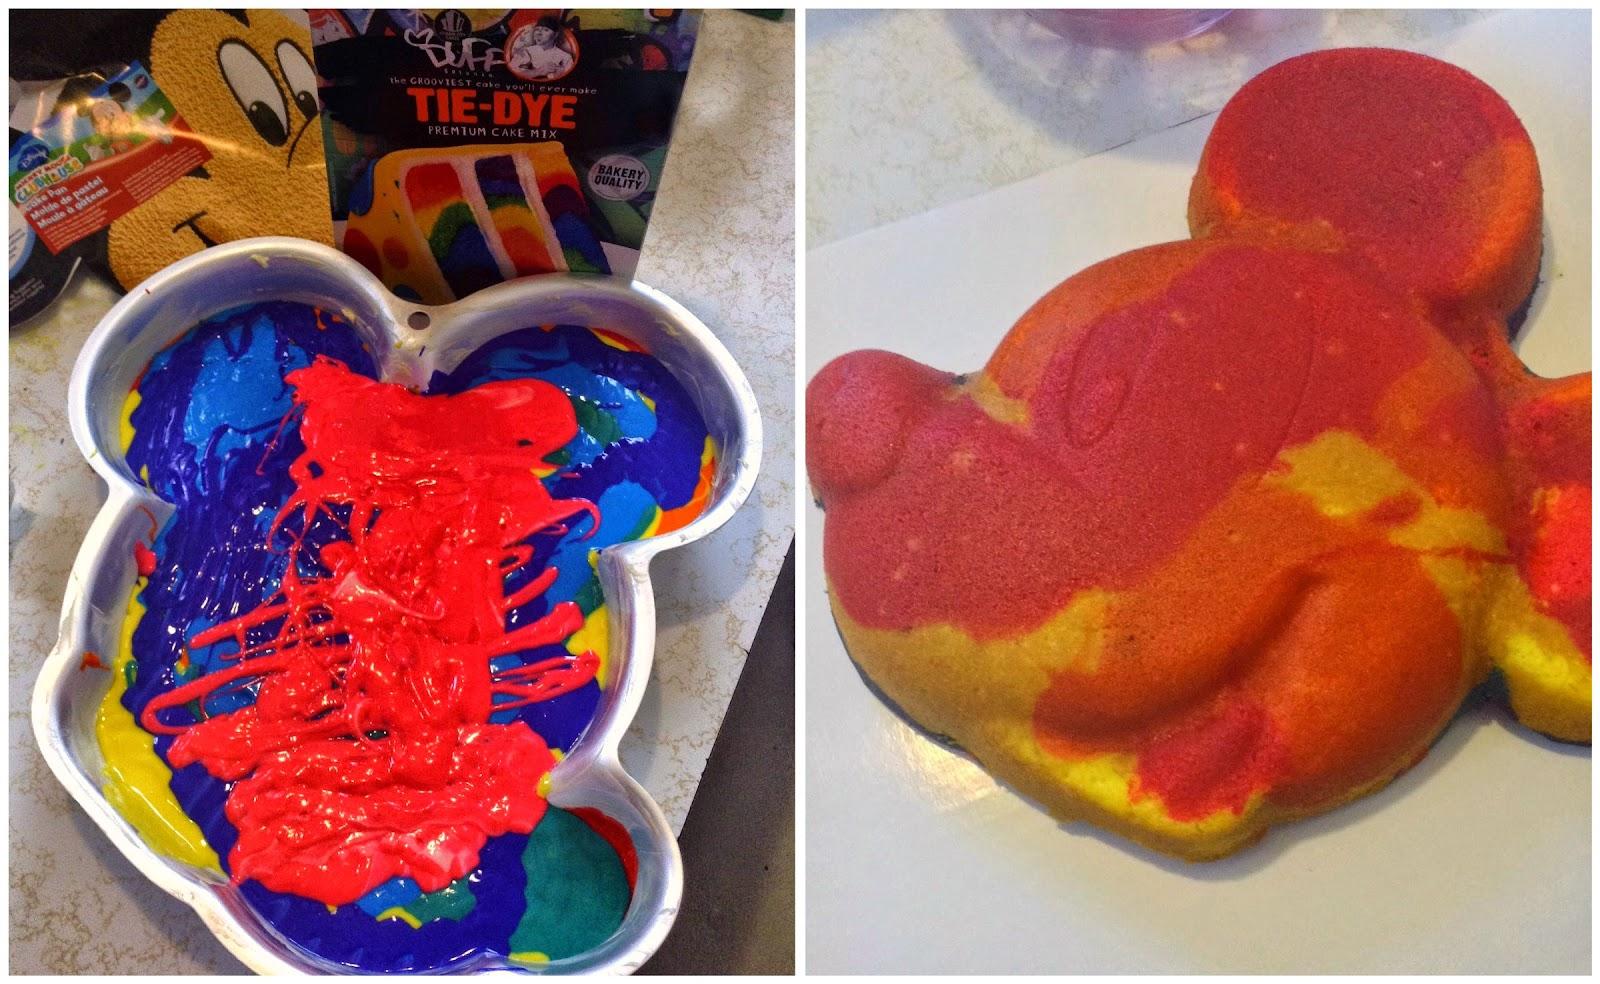 DisneySide tie dye cake